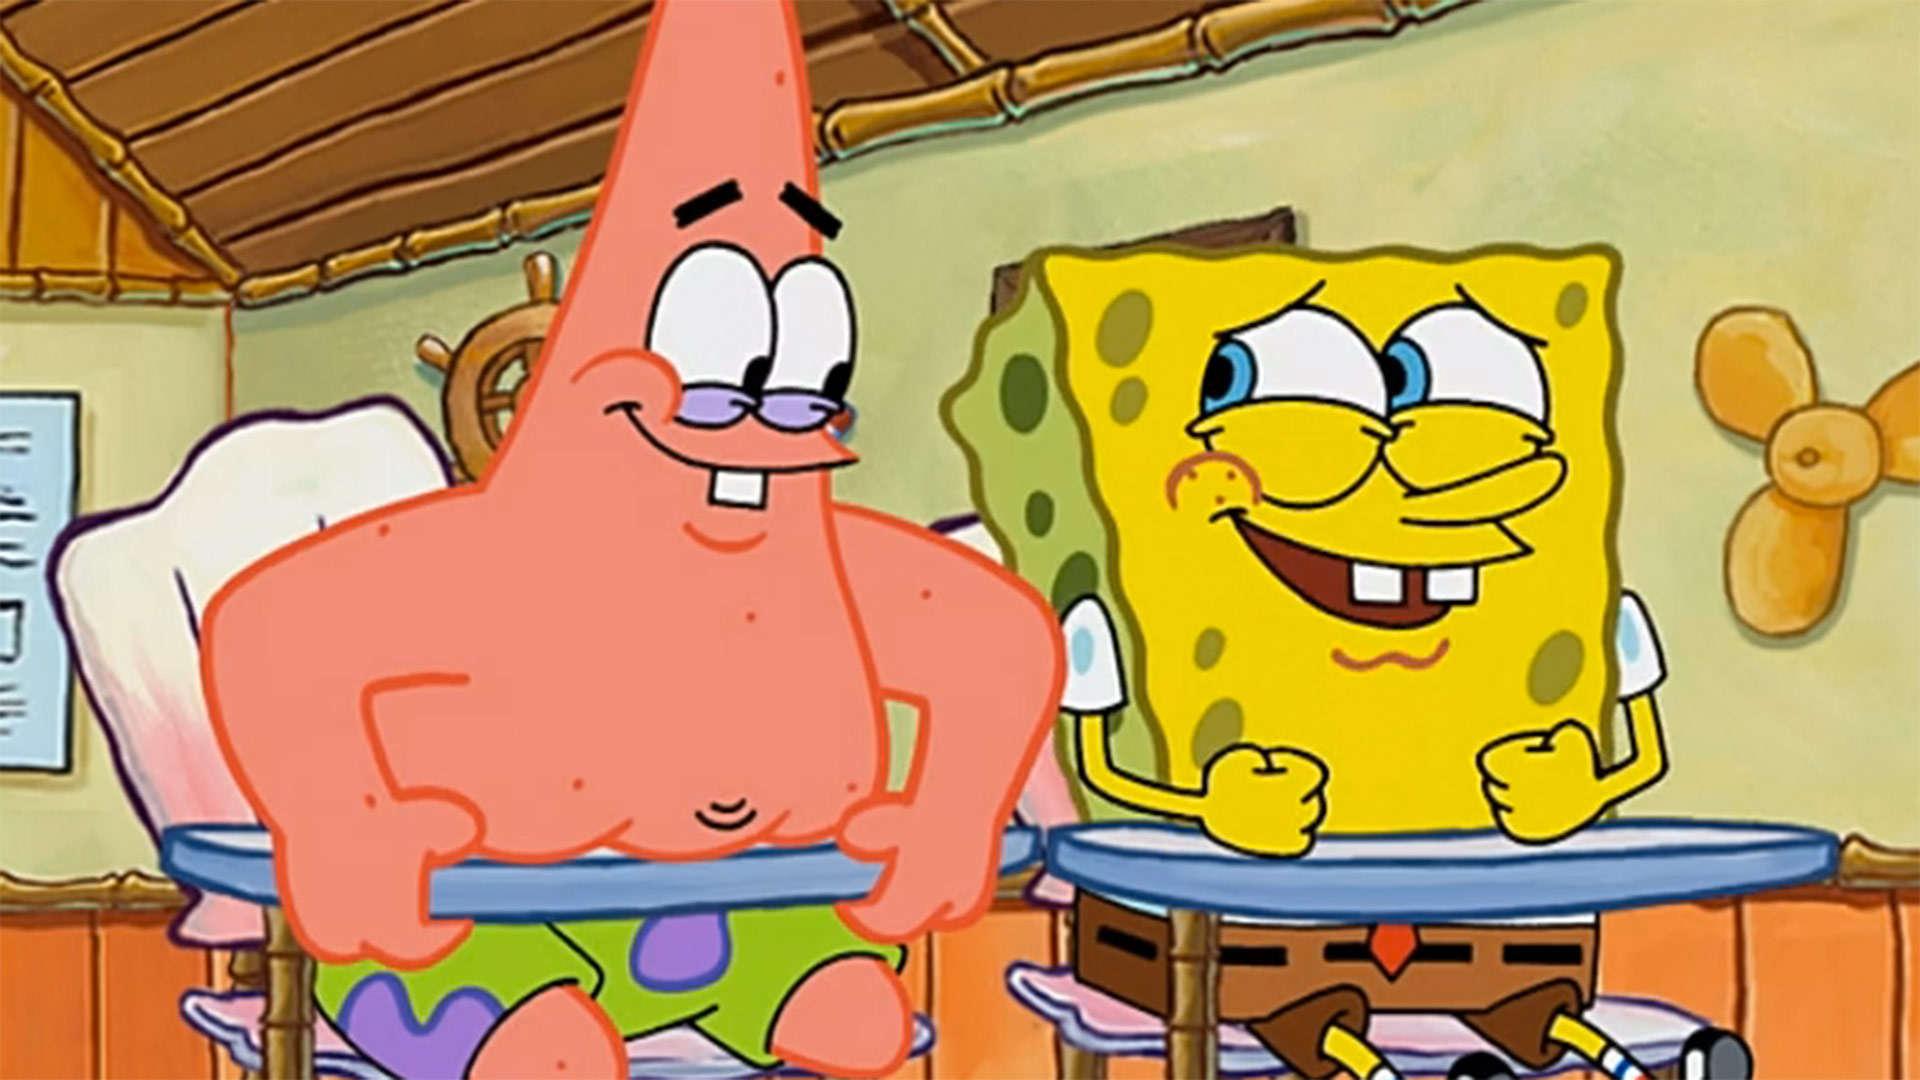 Steam Workshop Spongebob